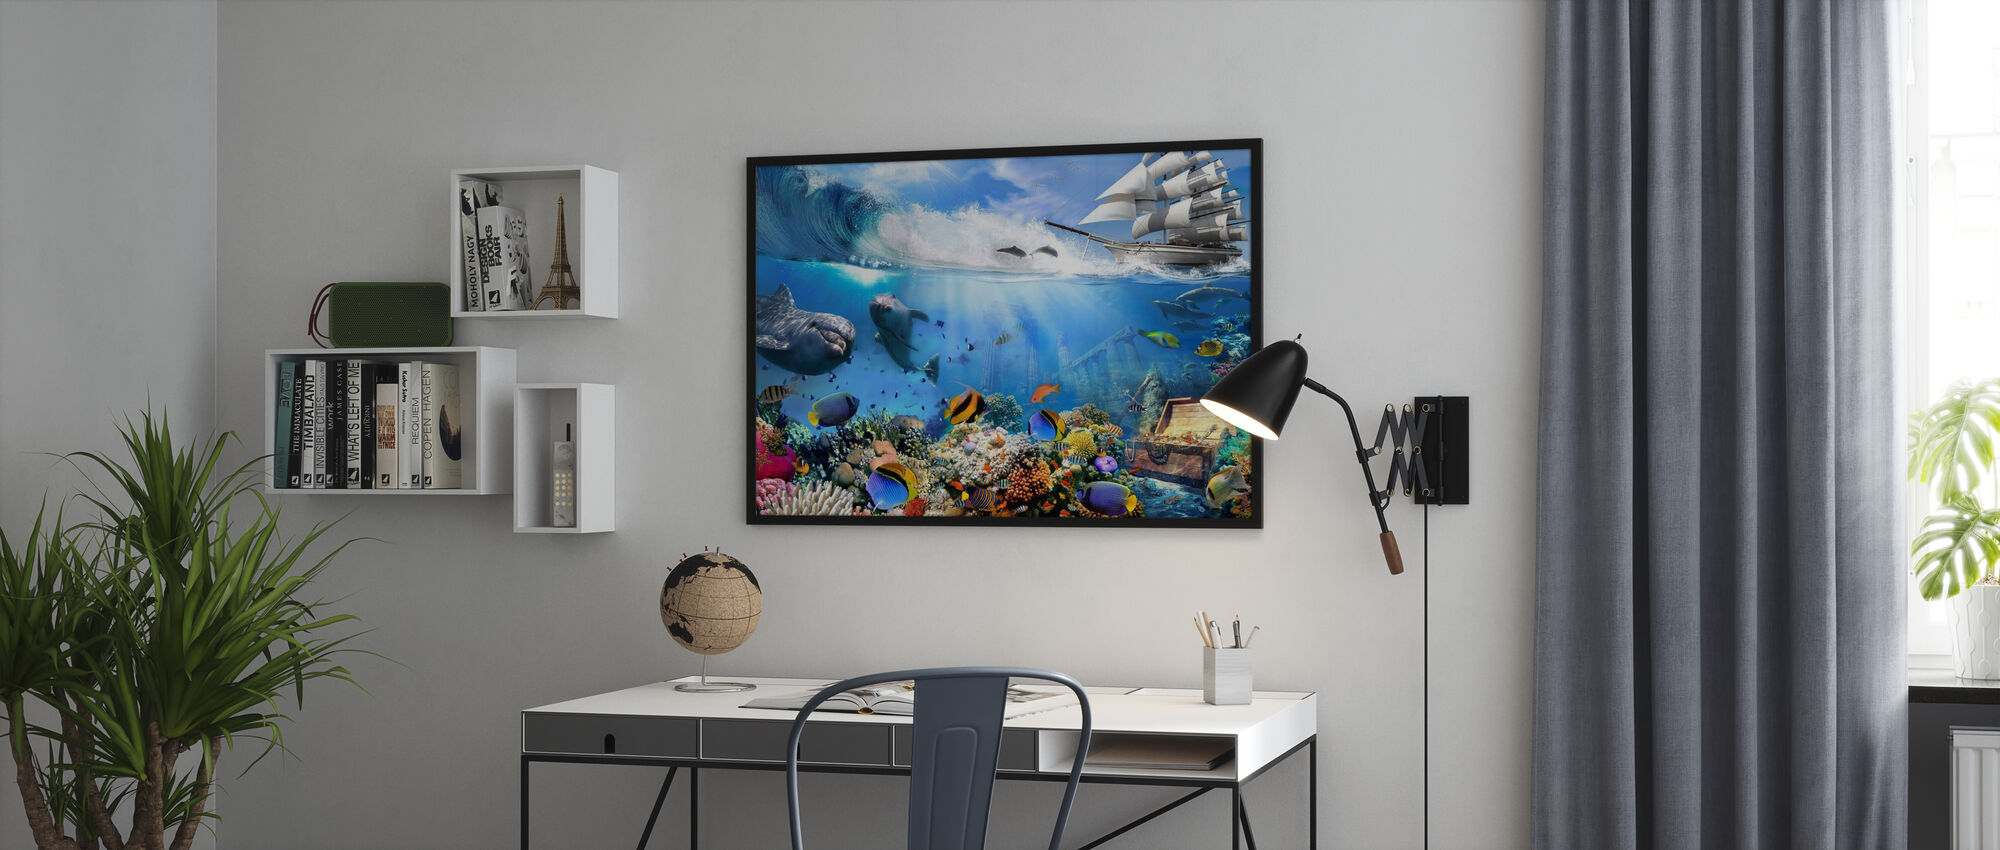 Fantasy Aqualife - Poster - Büro